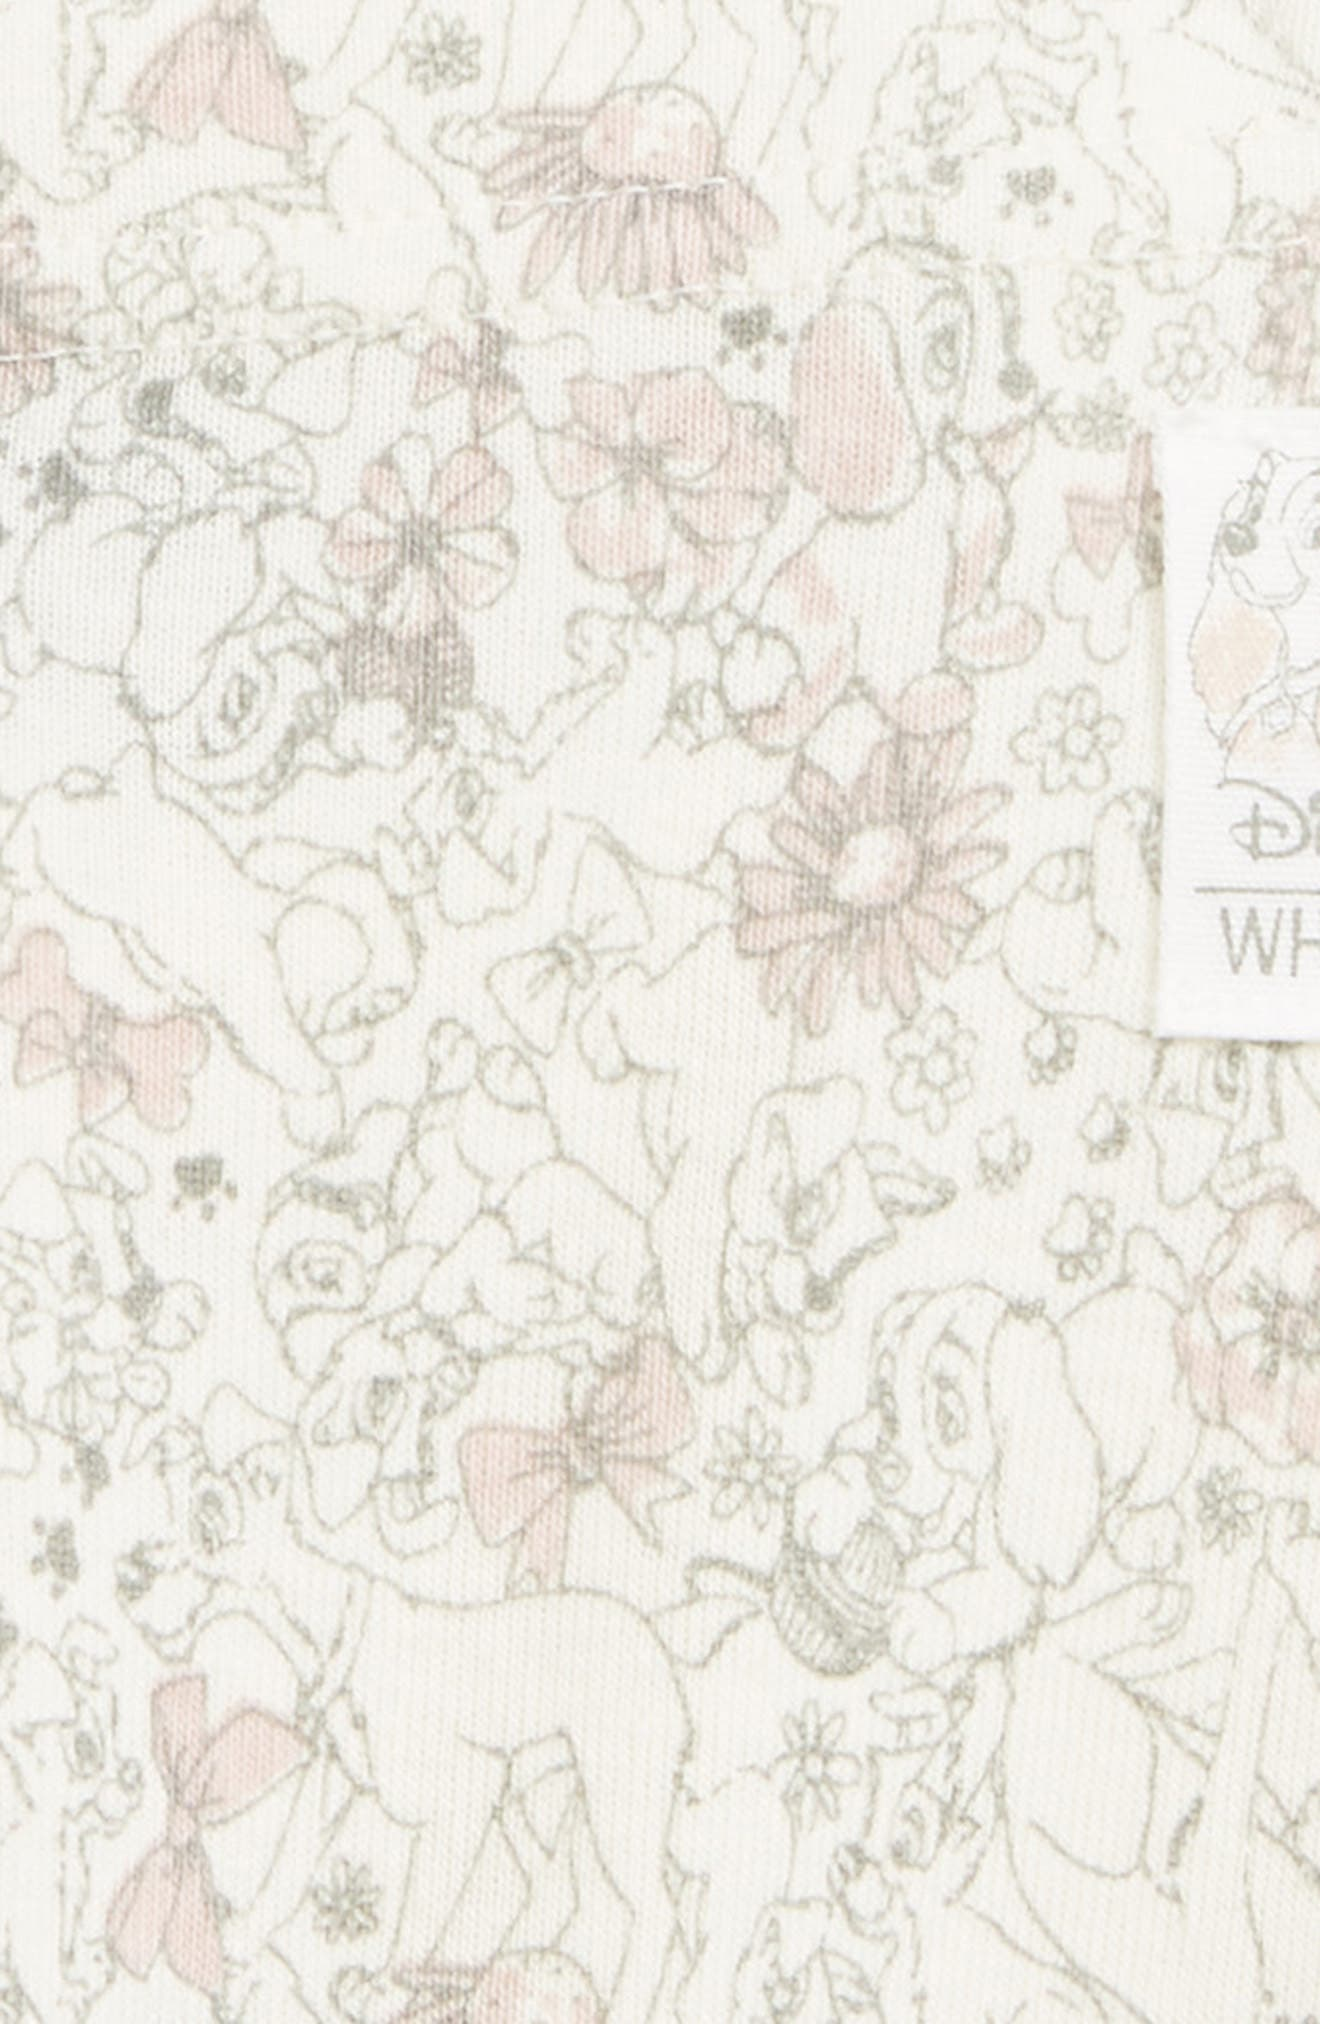 Disney 'Lady & the Tramp' Organic Cotton Leggings,                             Alternate thumbnail 2, color,                             Ivory